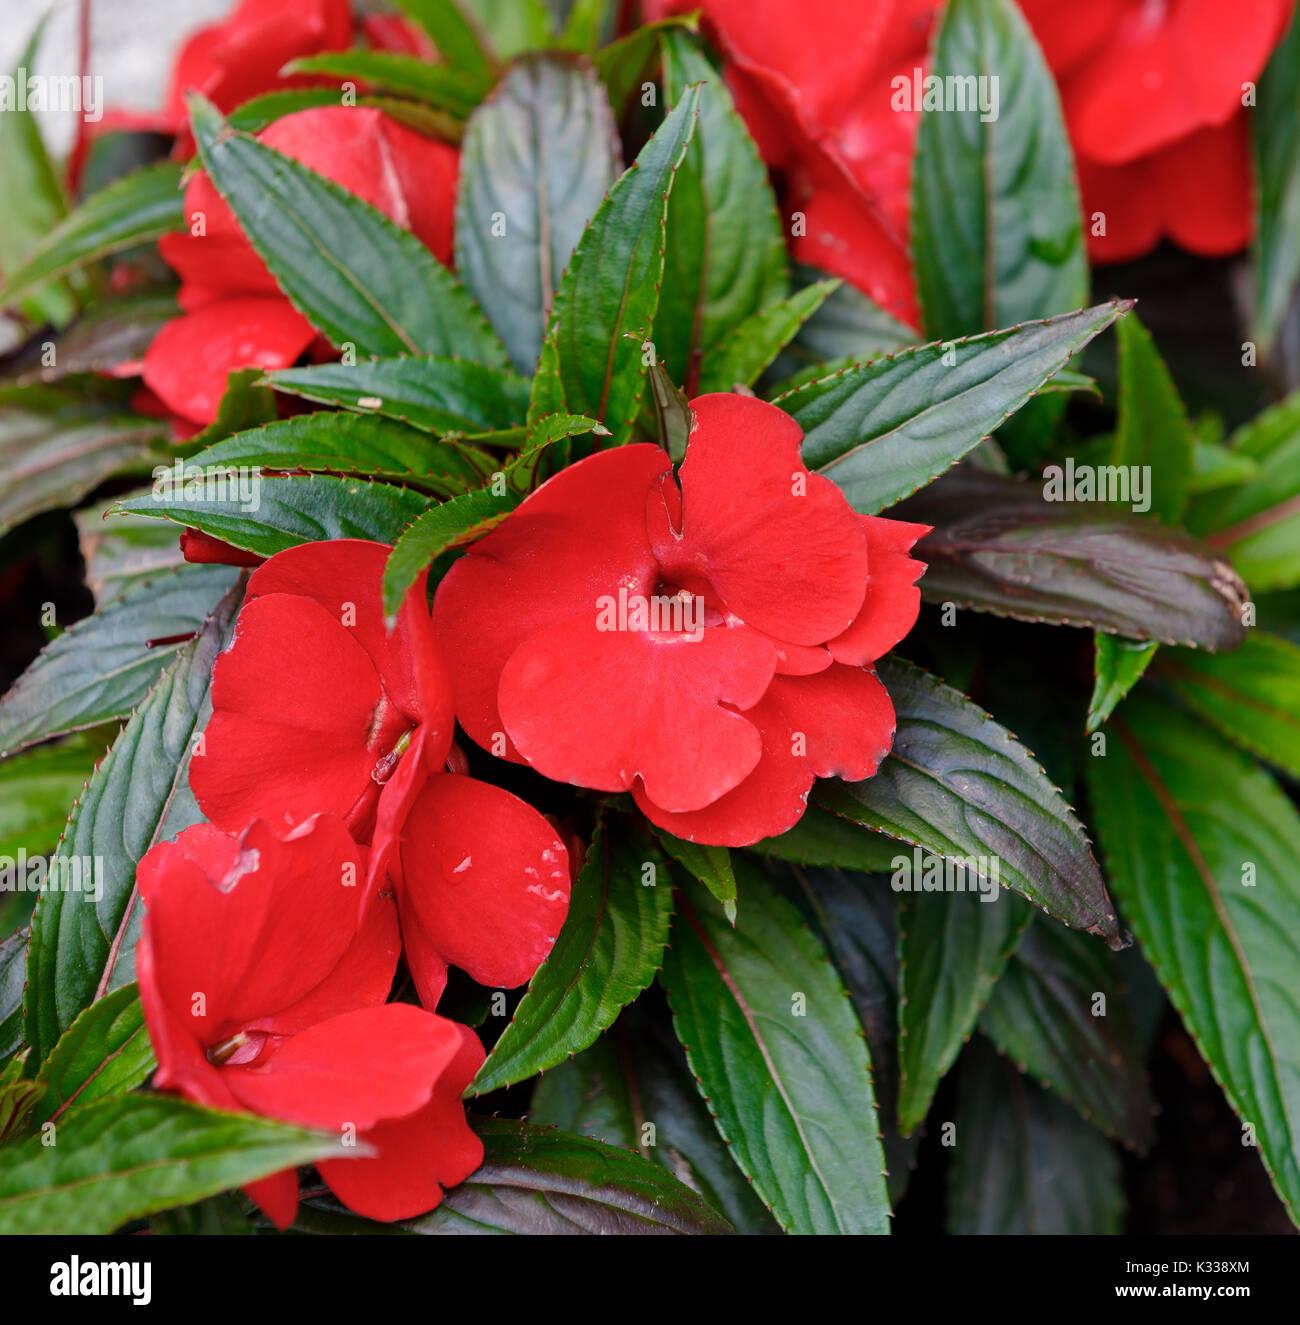 Fiori Nuova Guinea.Red And New Guinea Impatiens Flowers In Summer Garden Stock Photo